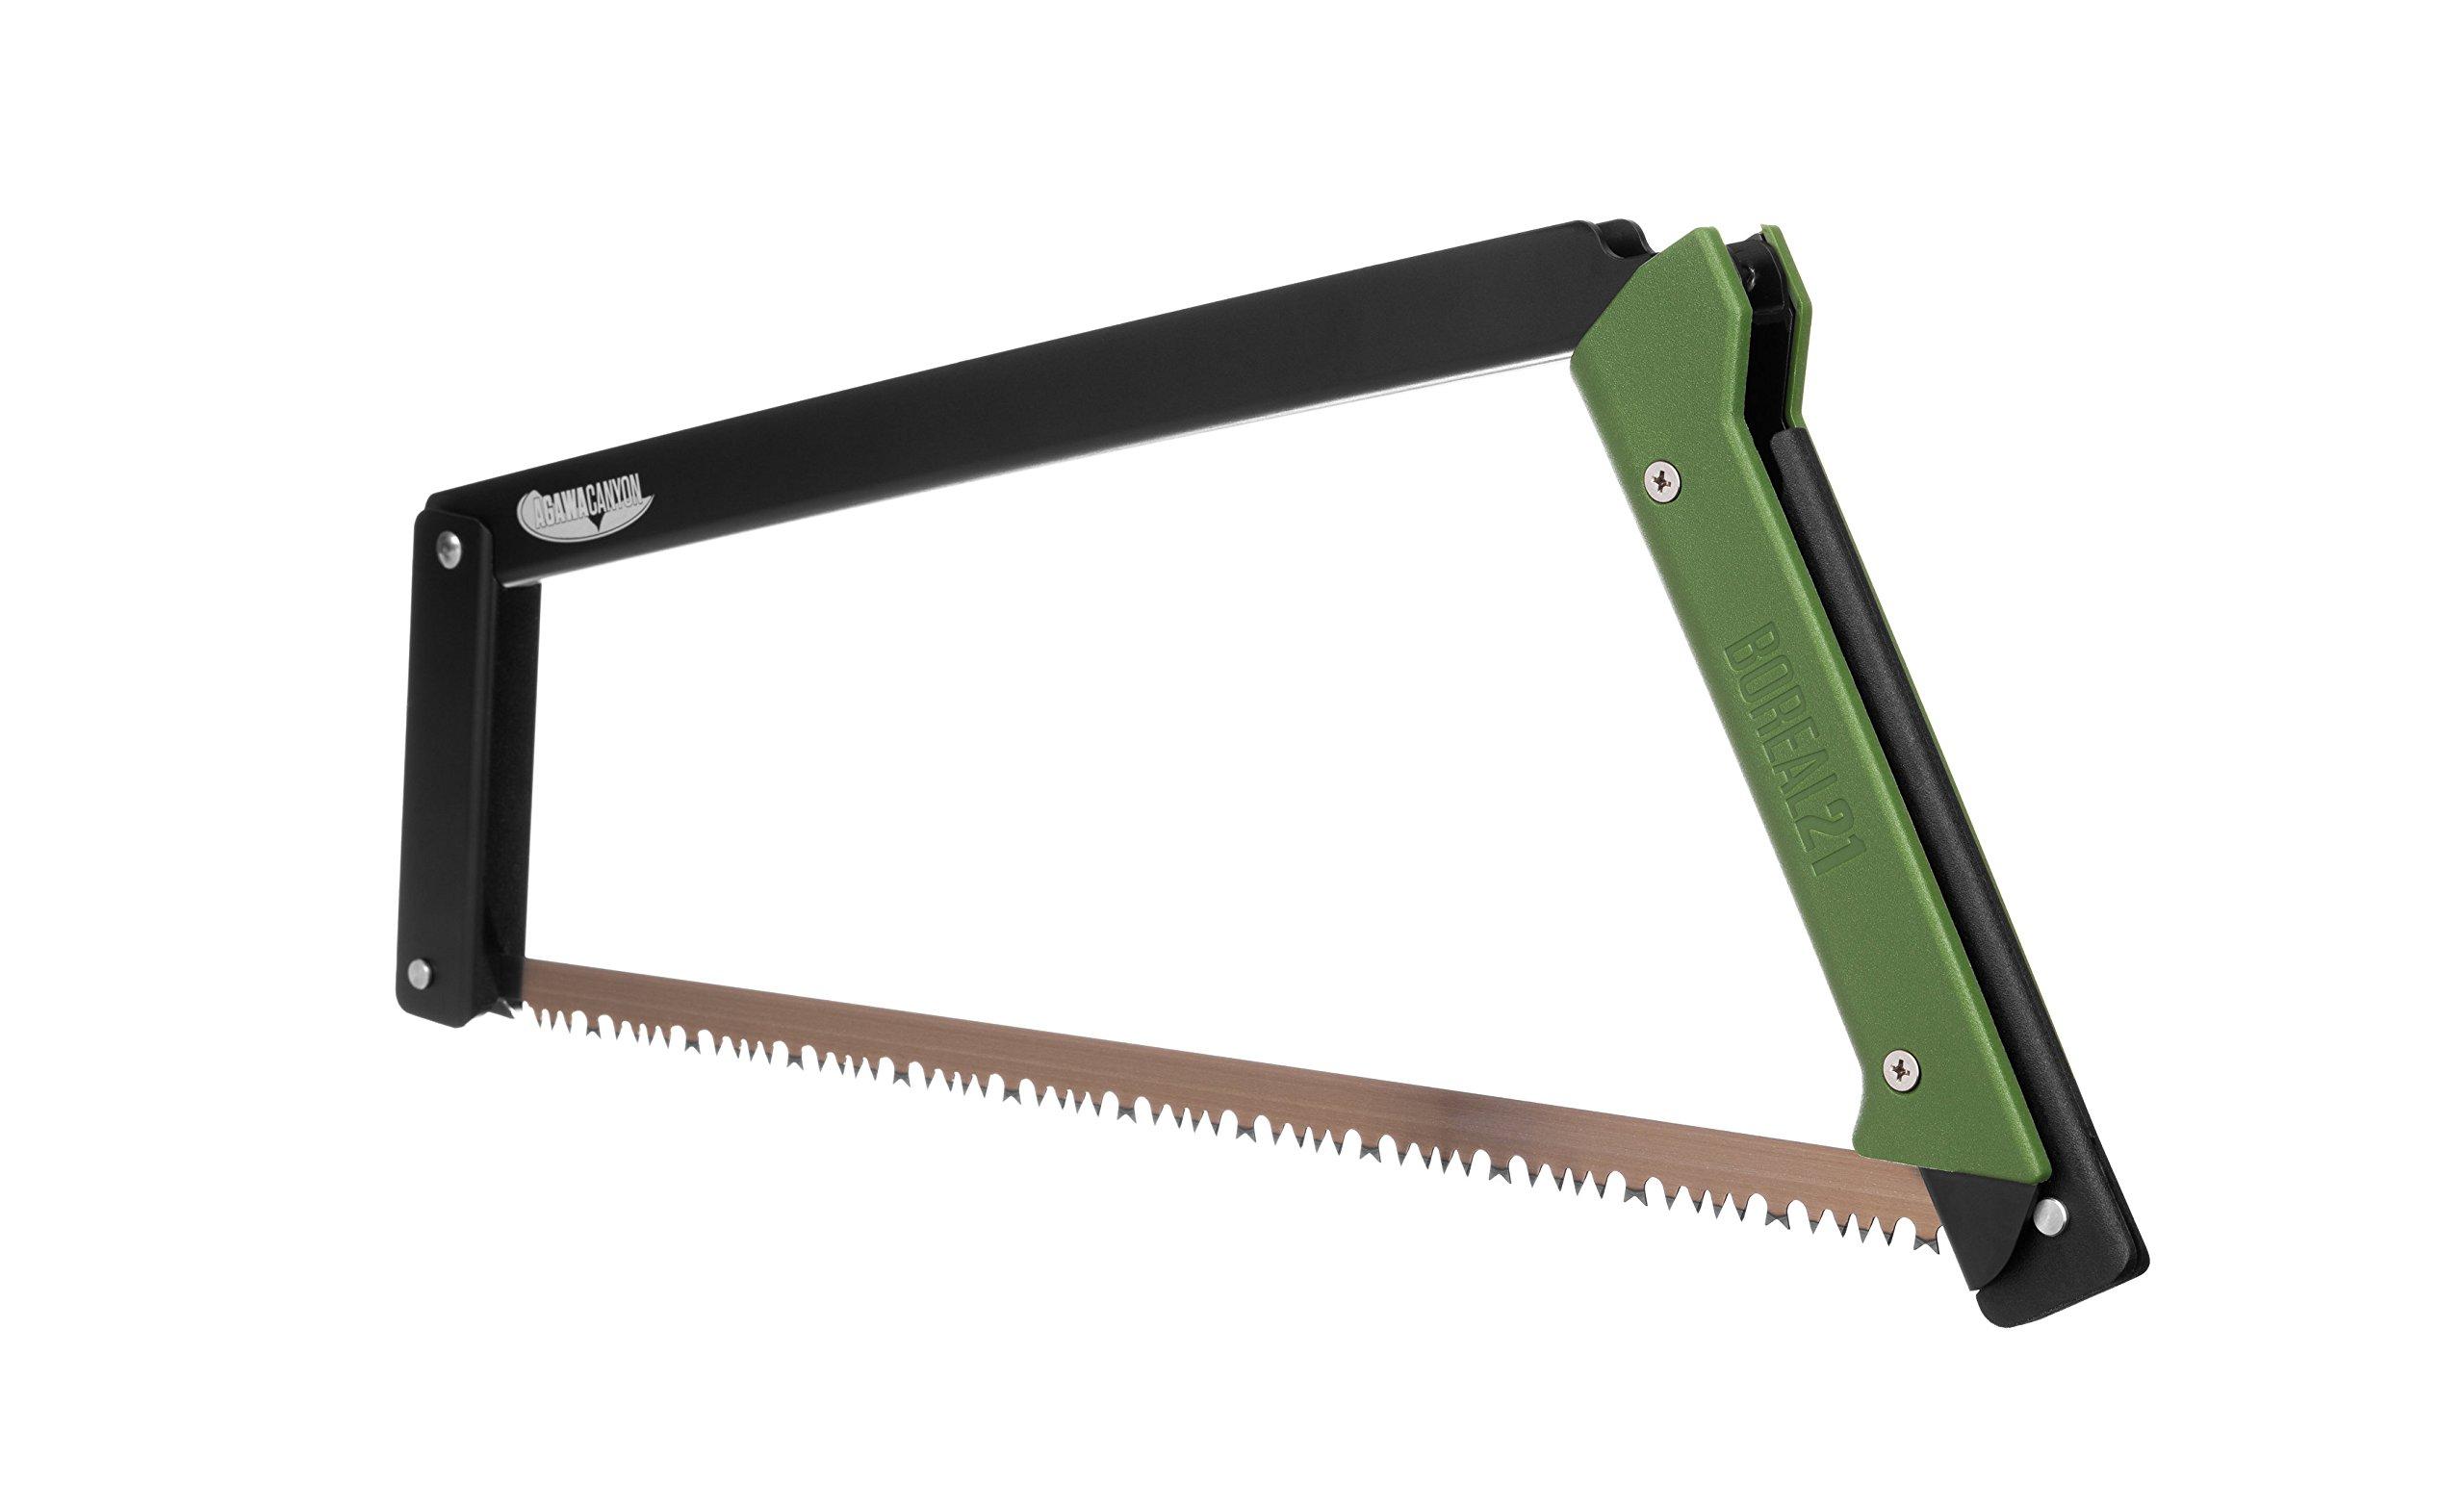 Agawa Canyon - BOREAL21 Folding Bow Saw - Black Frame, Green Handle, All-Purpose Blade